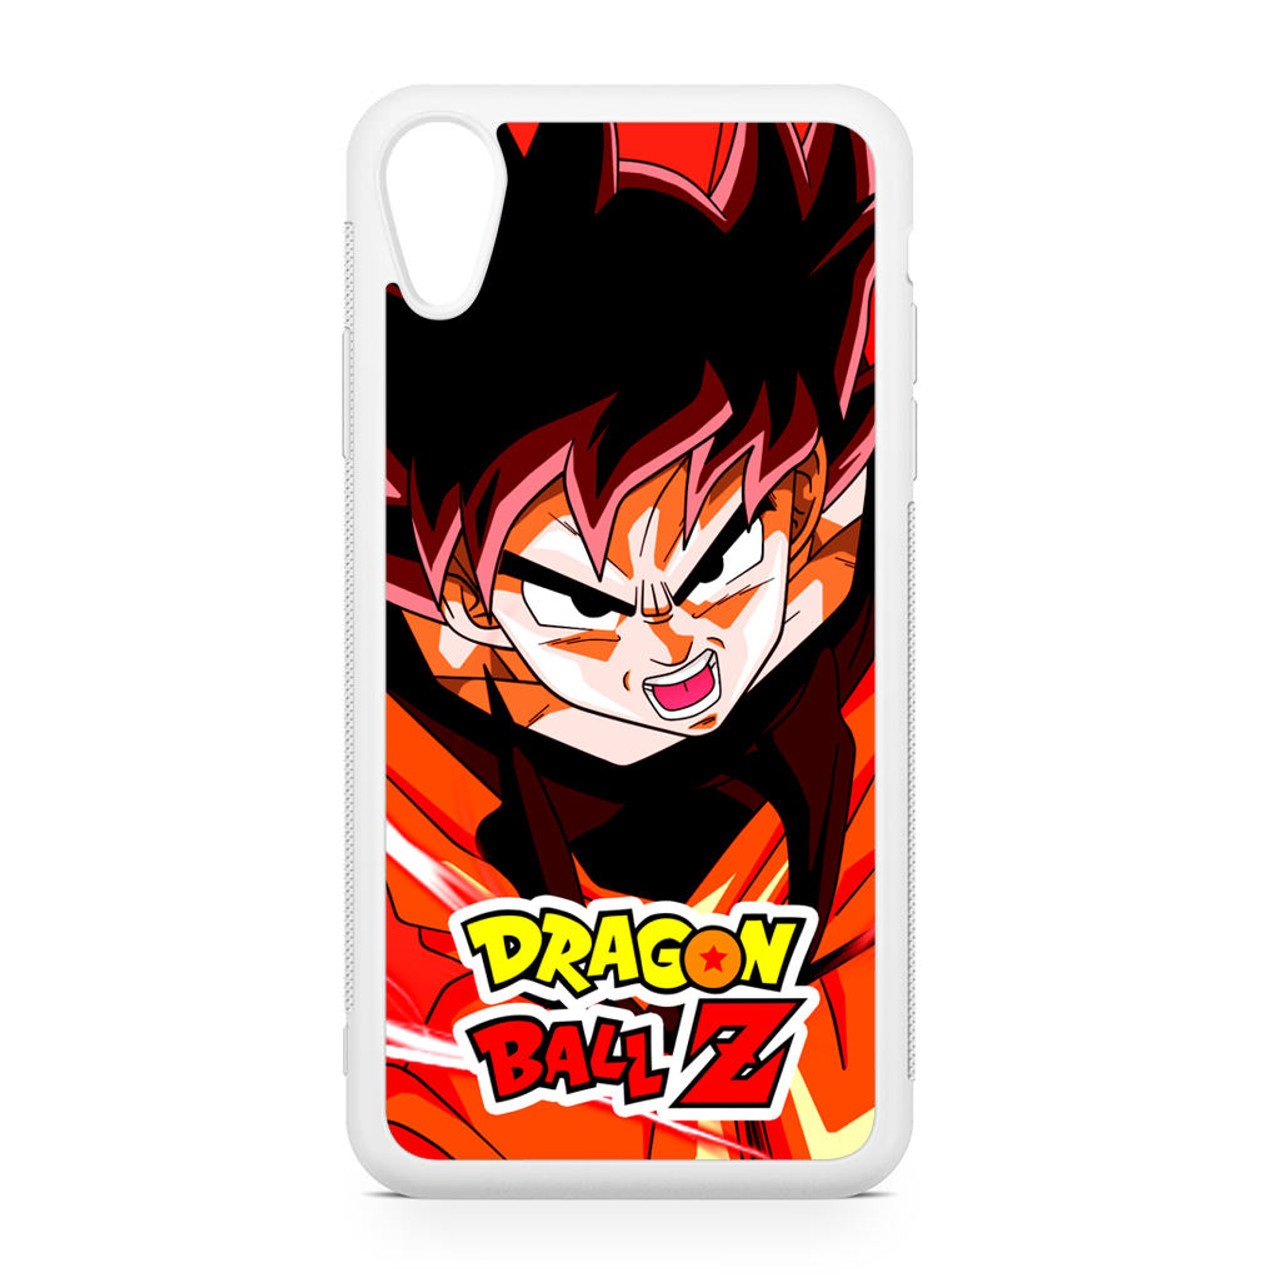 Son Goku 2 iphone case